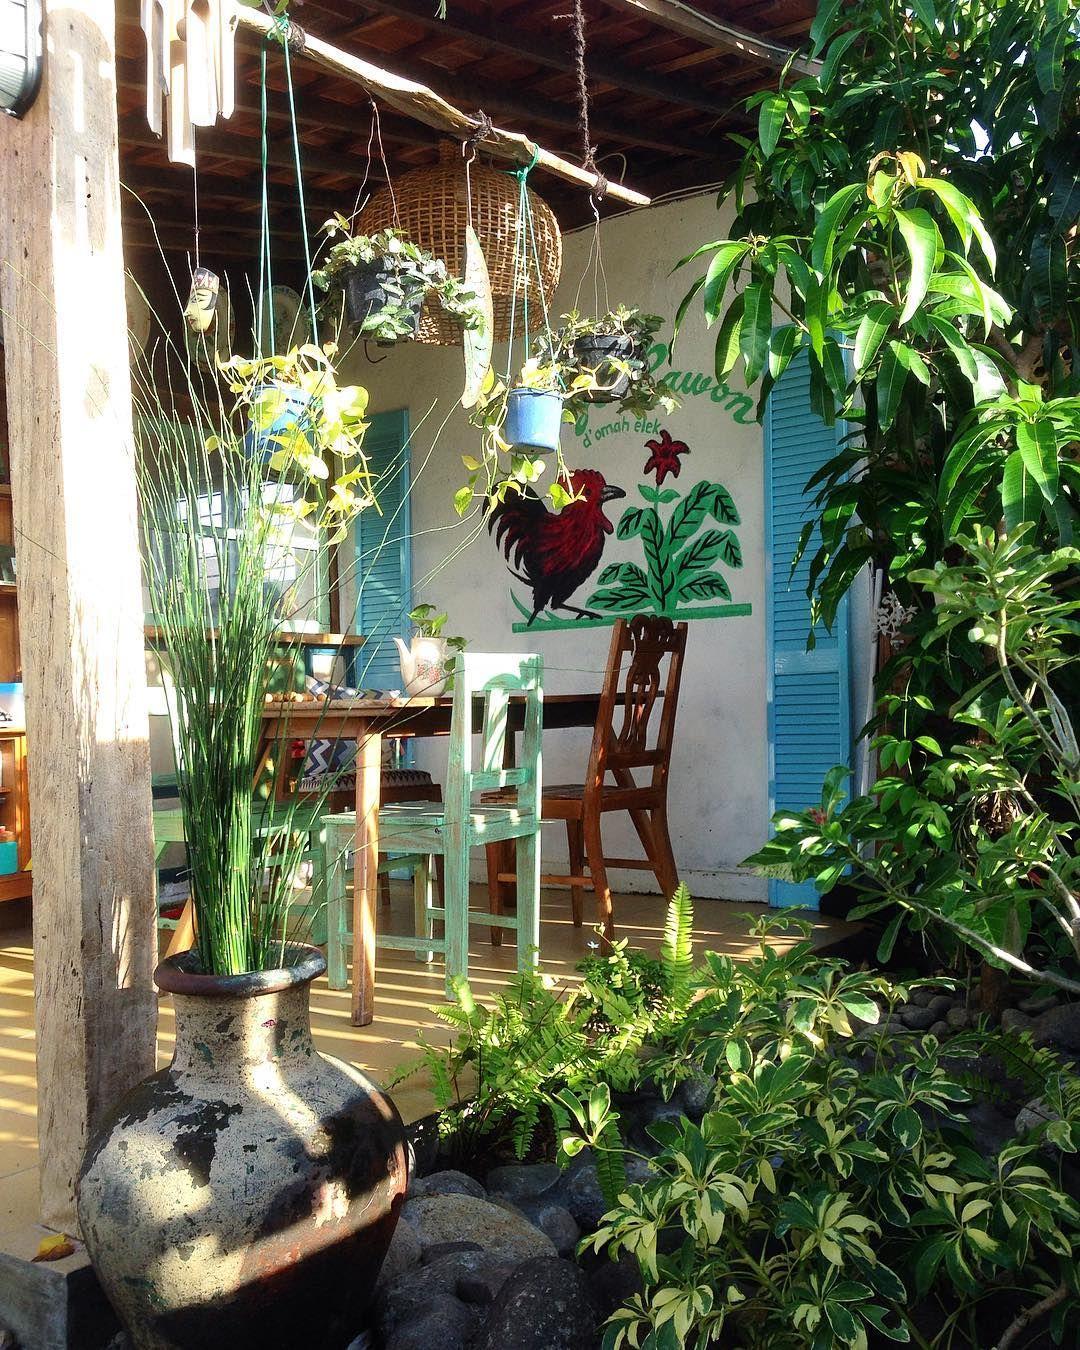 68 Likes 2 Comments Salim Maininterior On Instagram Hello December Tumbuh Bersama Alam Quot Rumah Kebun Arsitektur Dekorasi Rumah